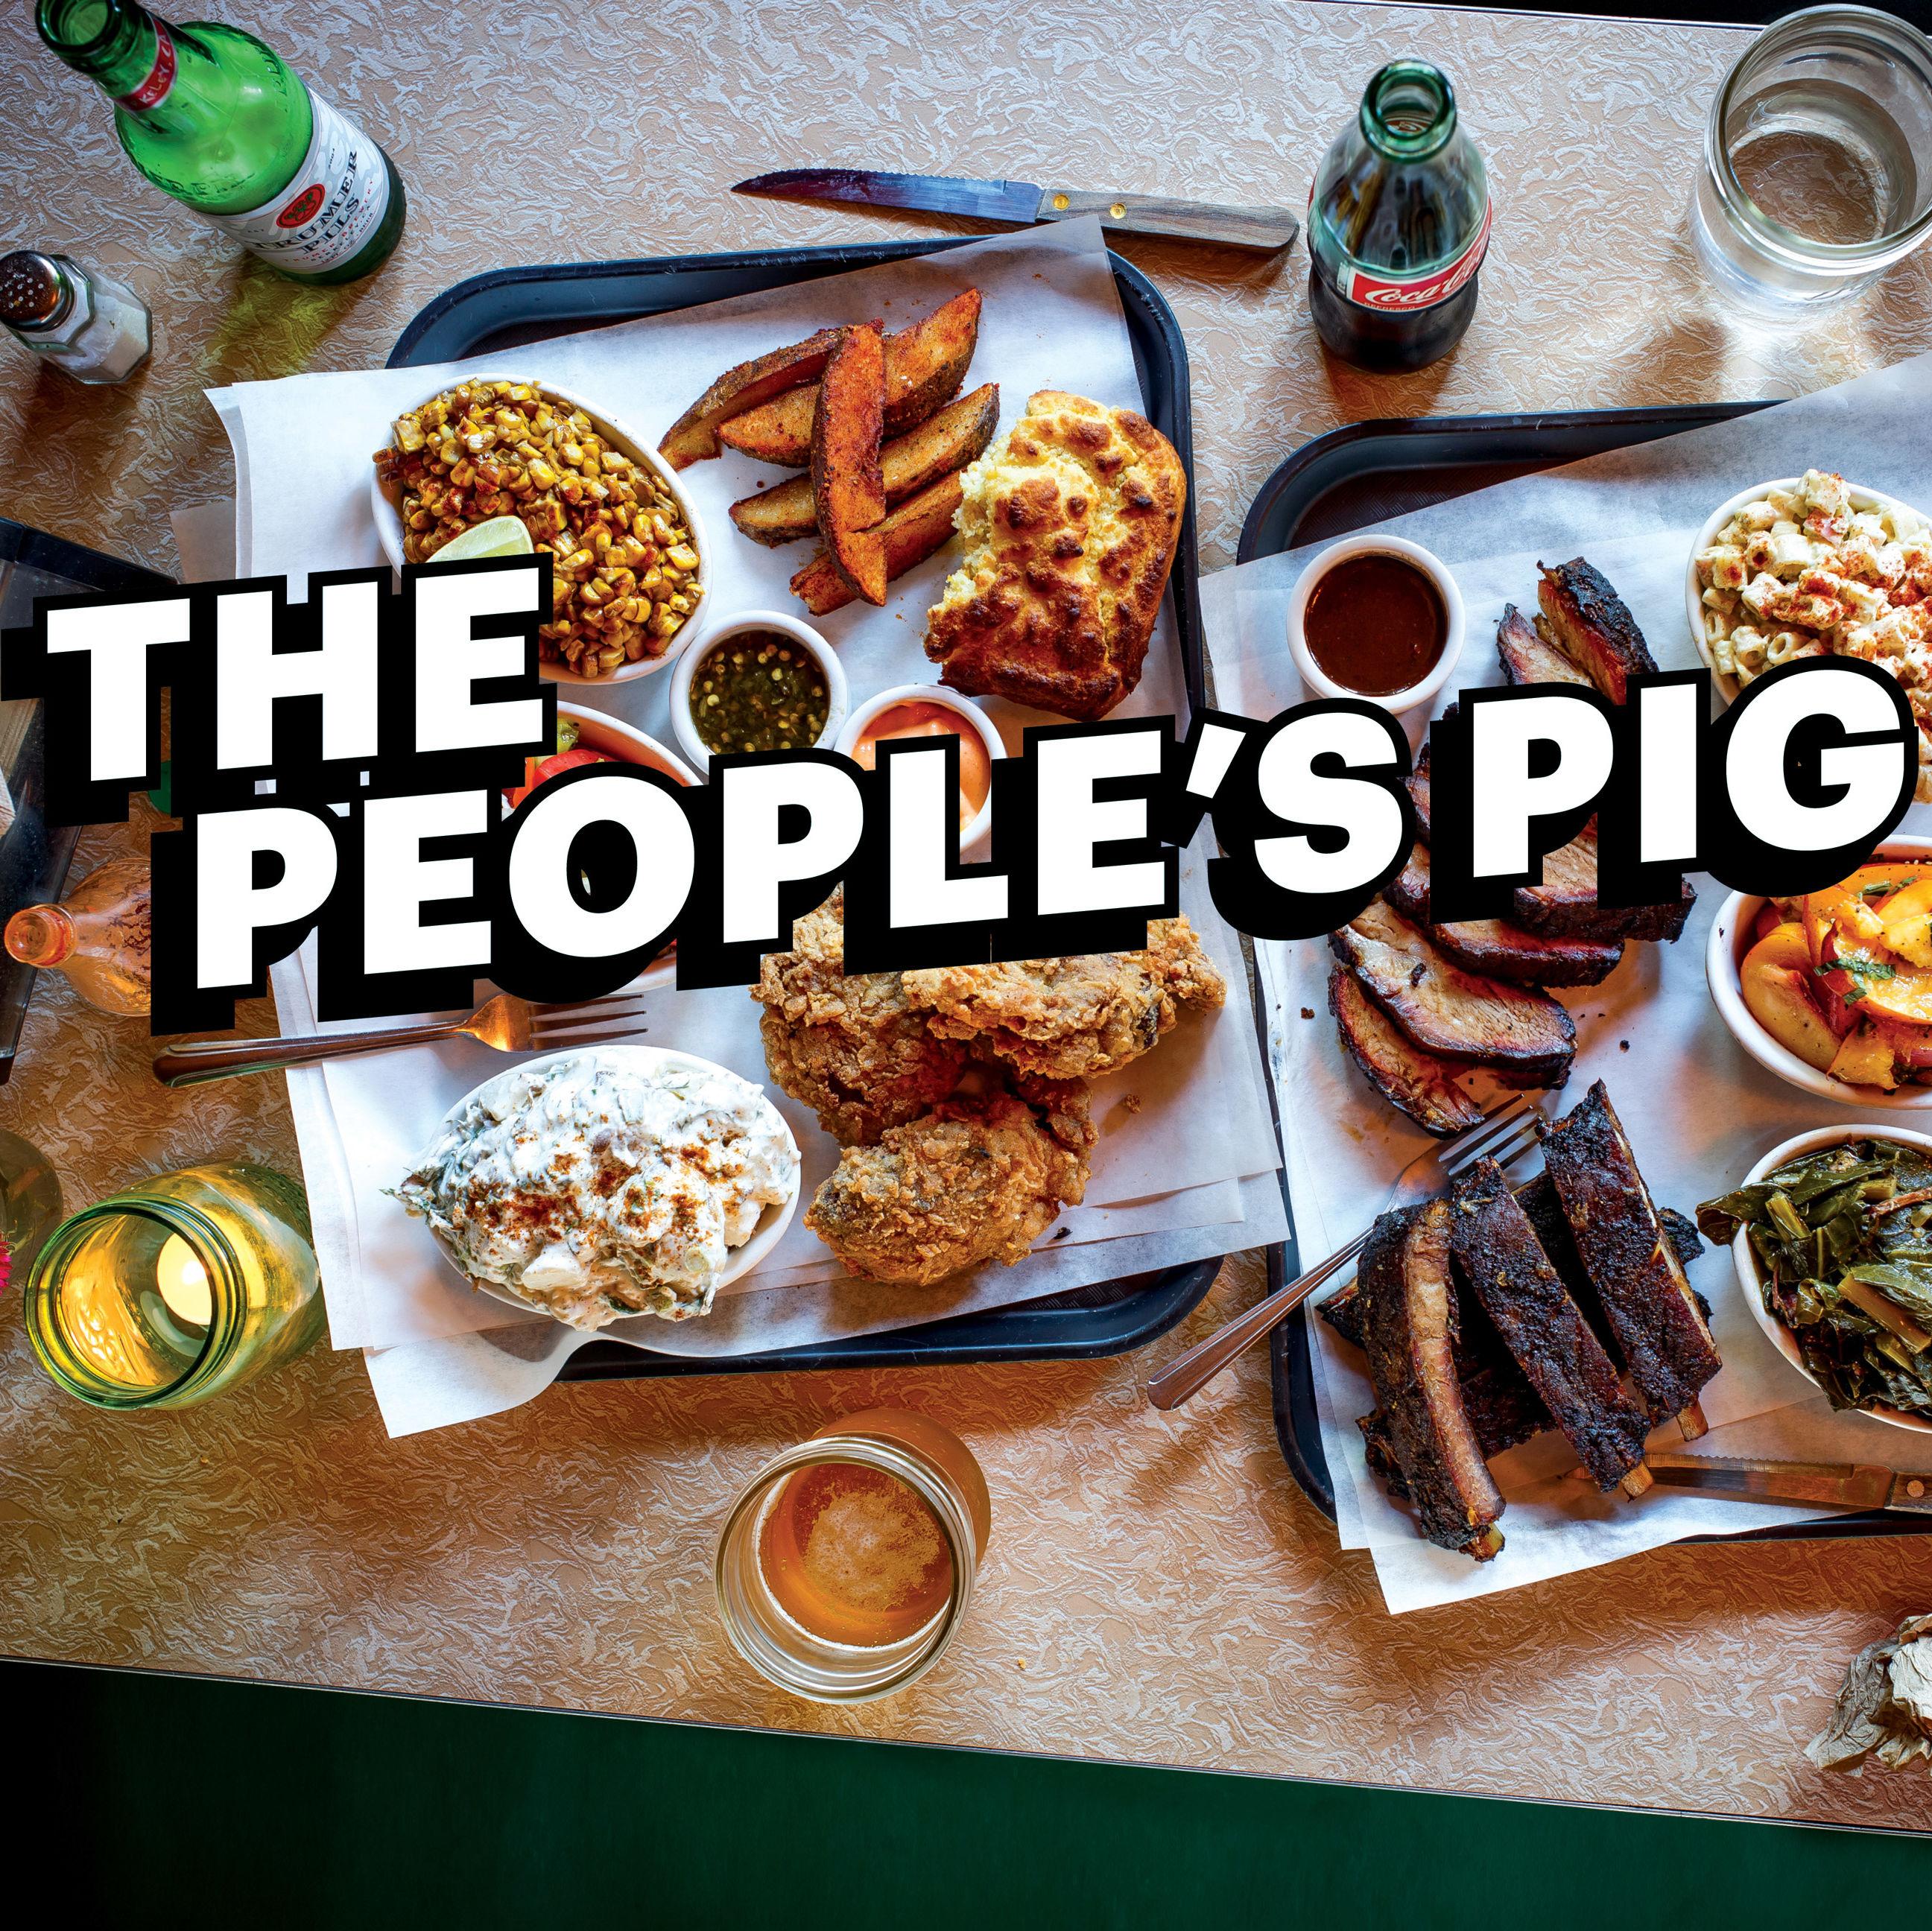 1115 peoples pig fmszdn